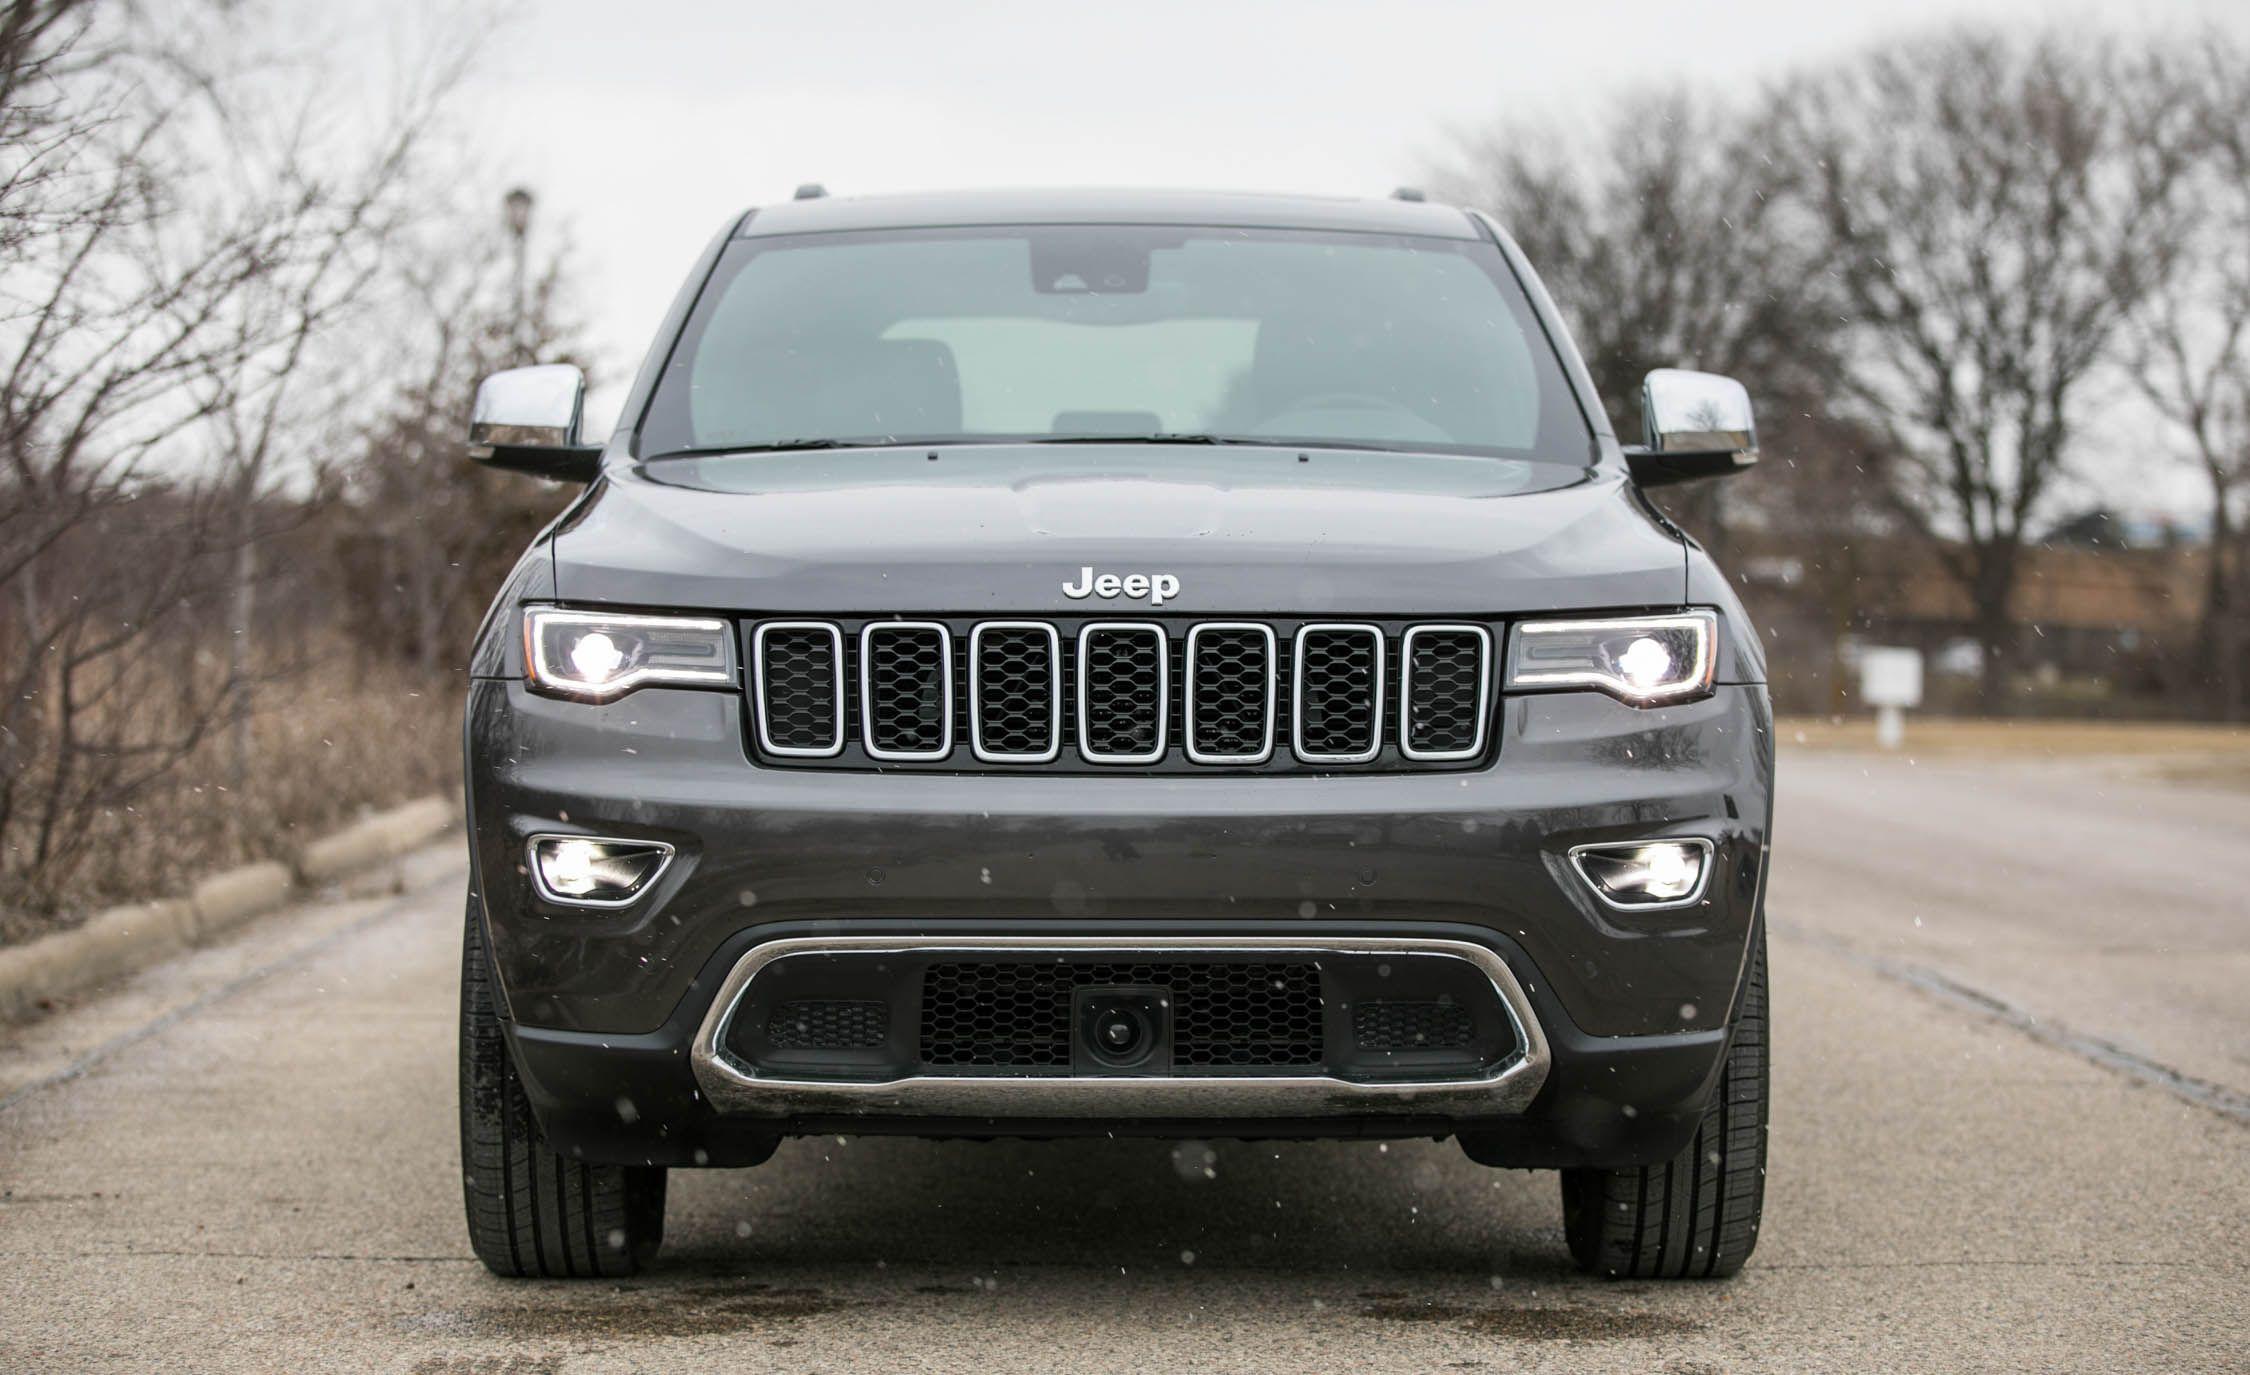 2018 Jeep Grand Cherokee Engine And